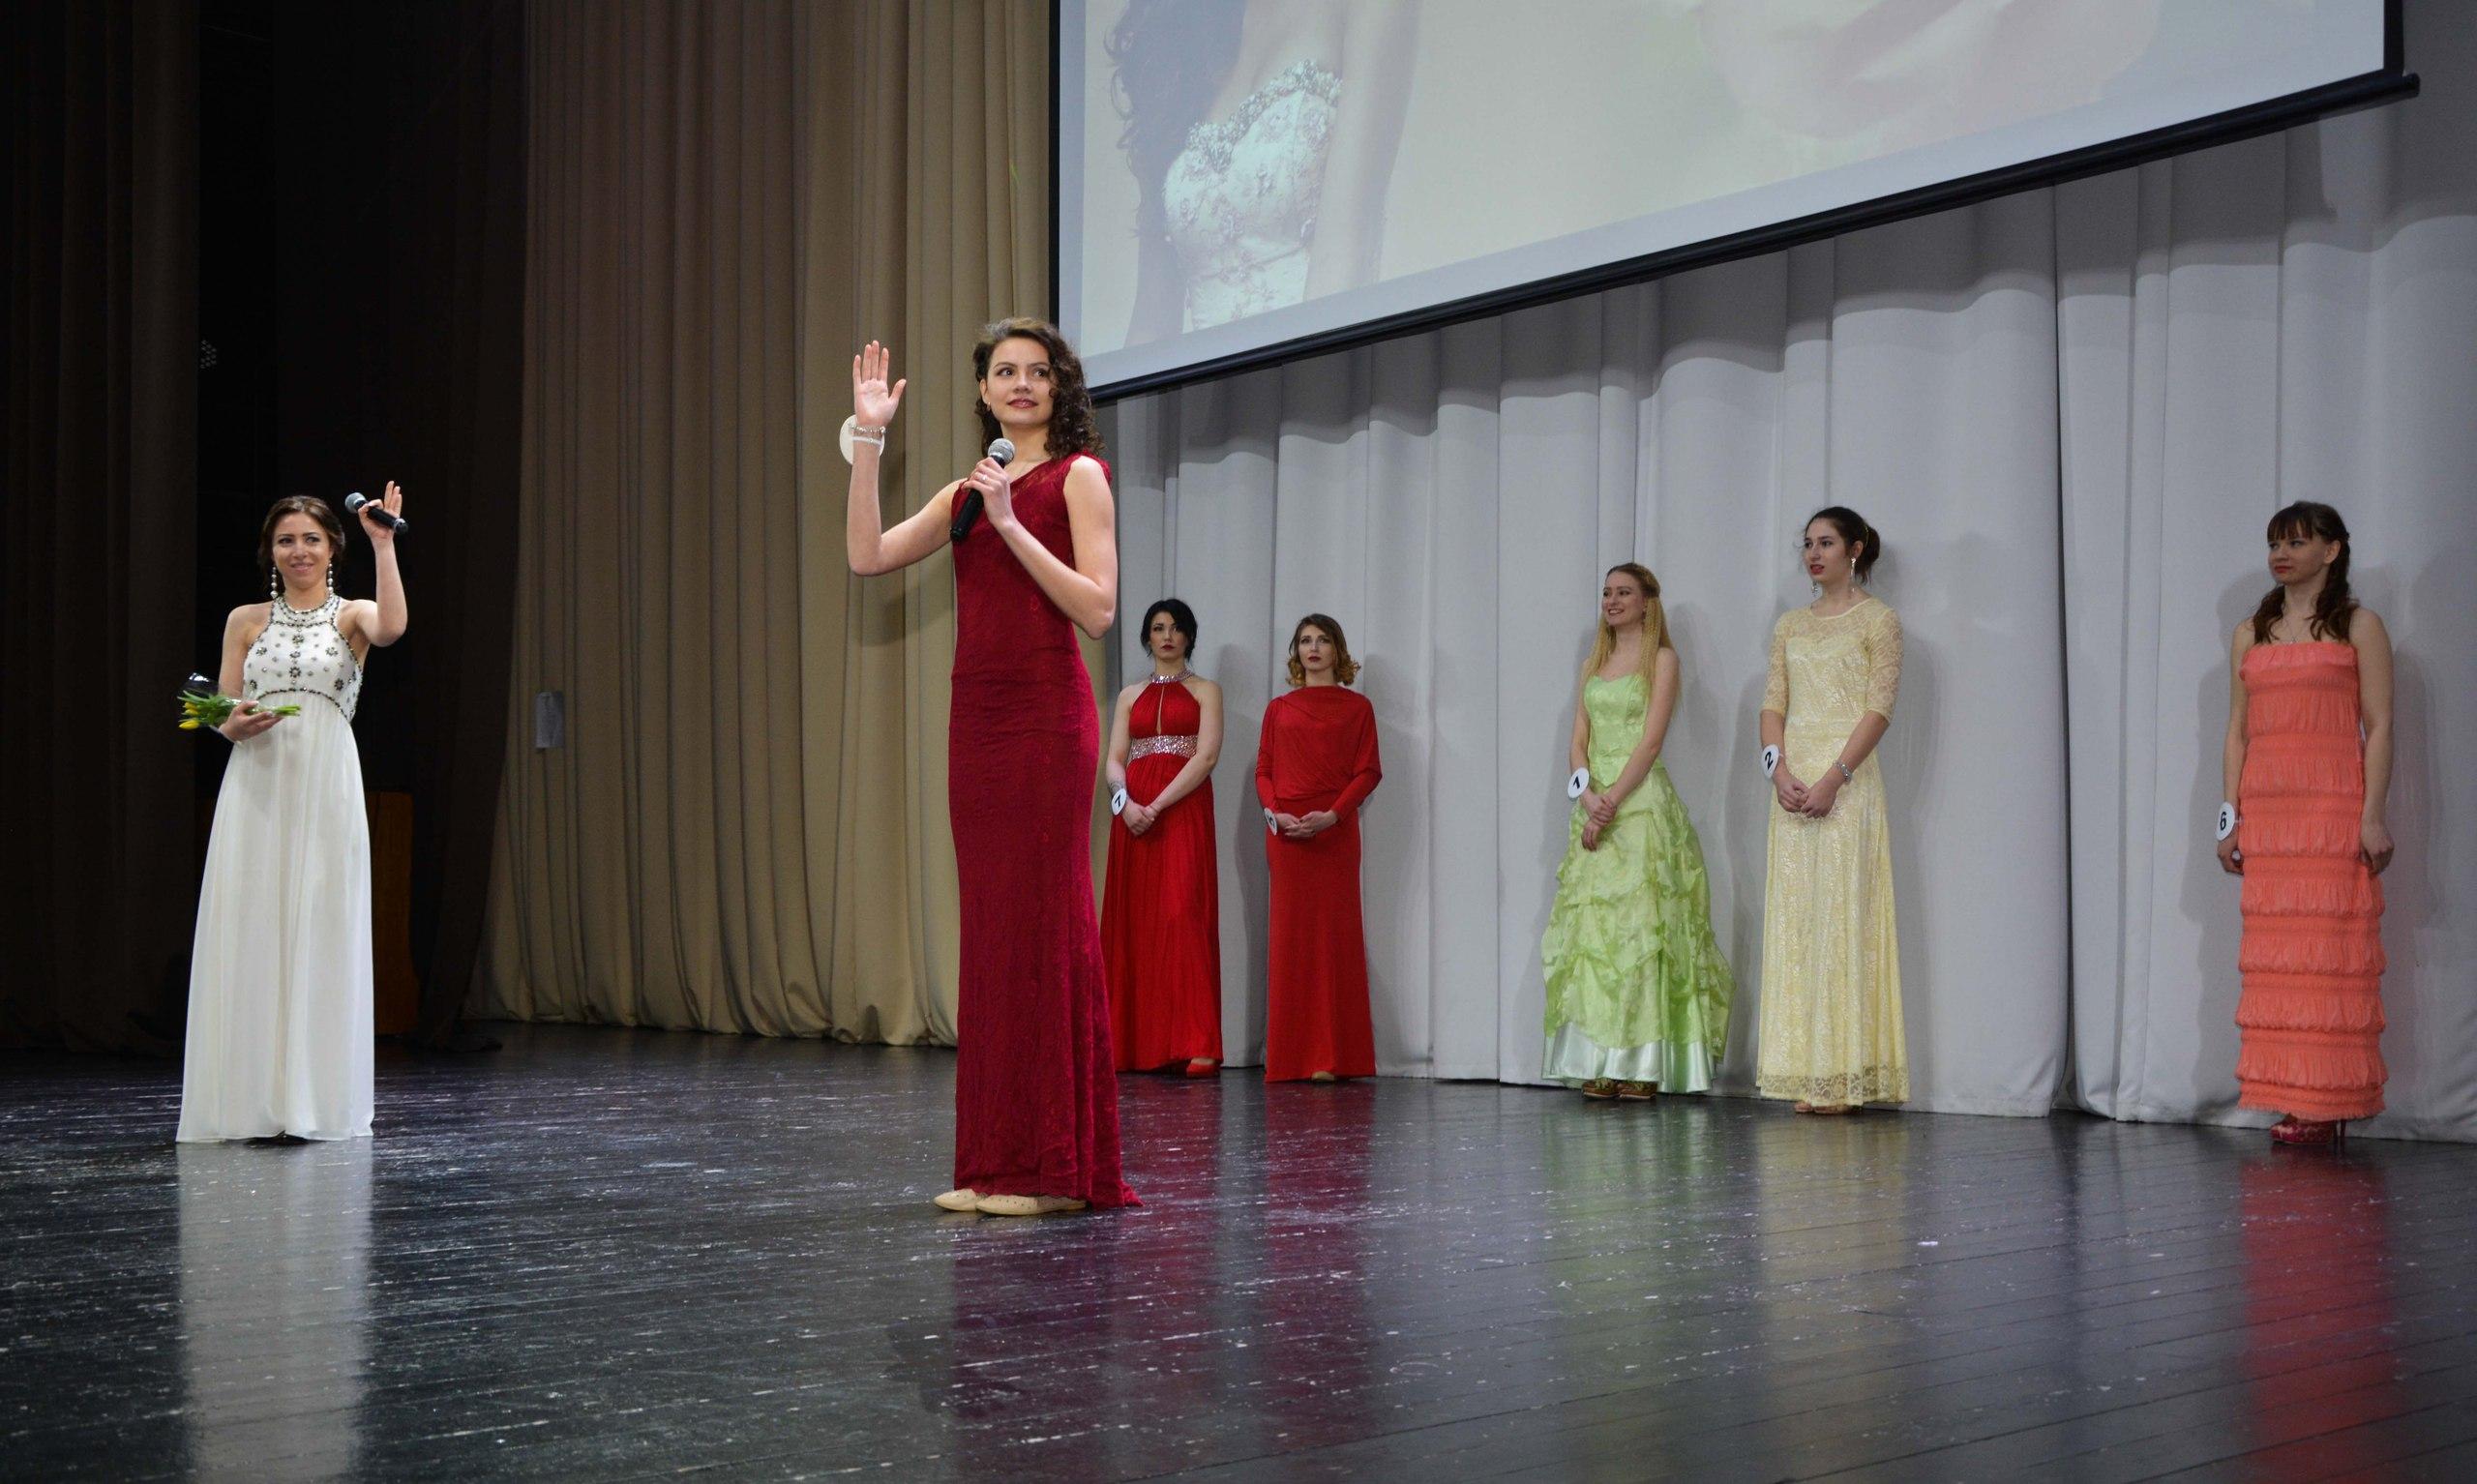 Титул «Мисс  янтарная  весна-2018» получила Валерия Рудникова